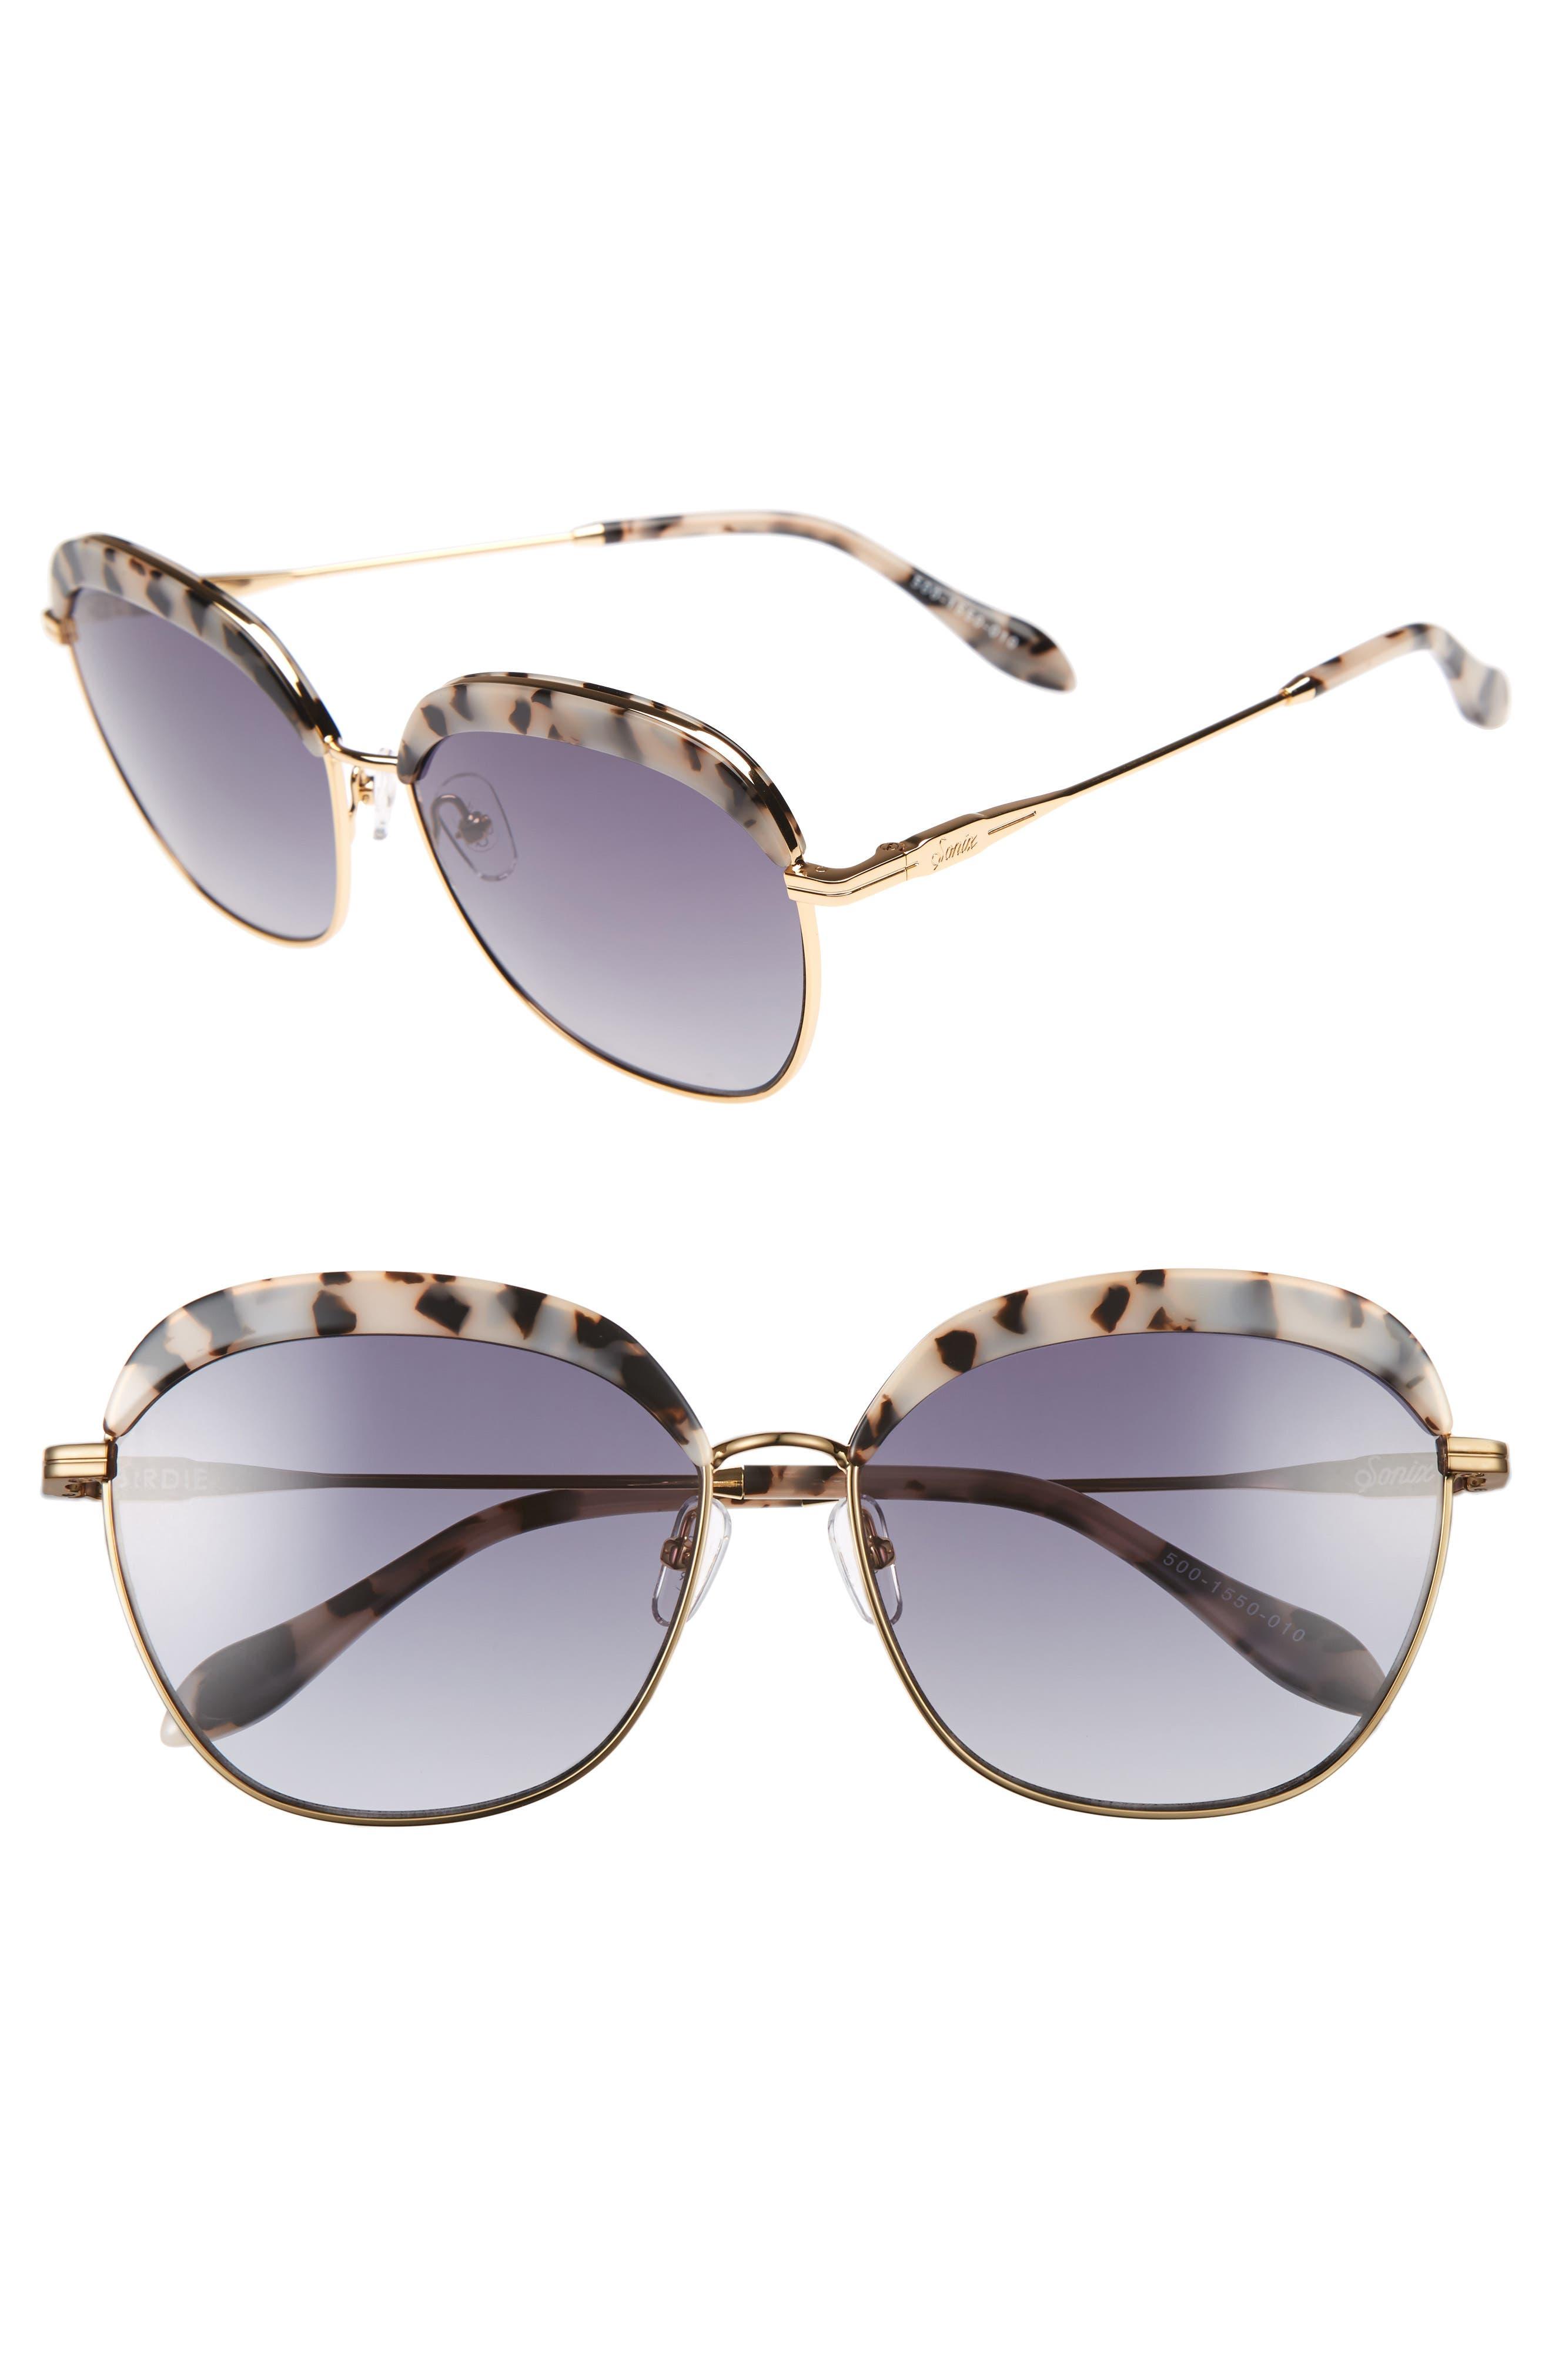 Birdie 60mm Oversize Sunglasses,                         Main,                         color, Milk Tort/ Black Fade